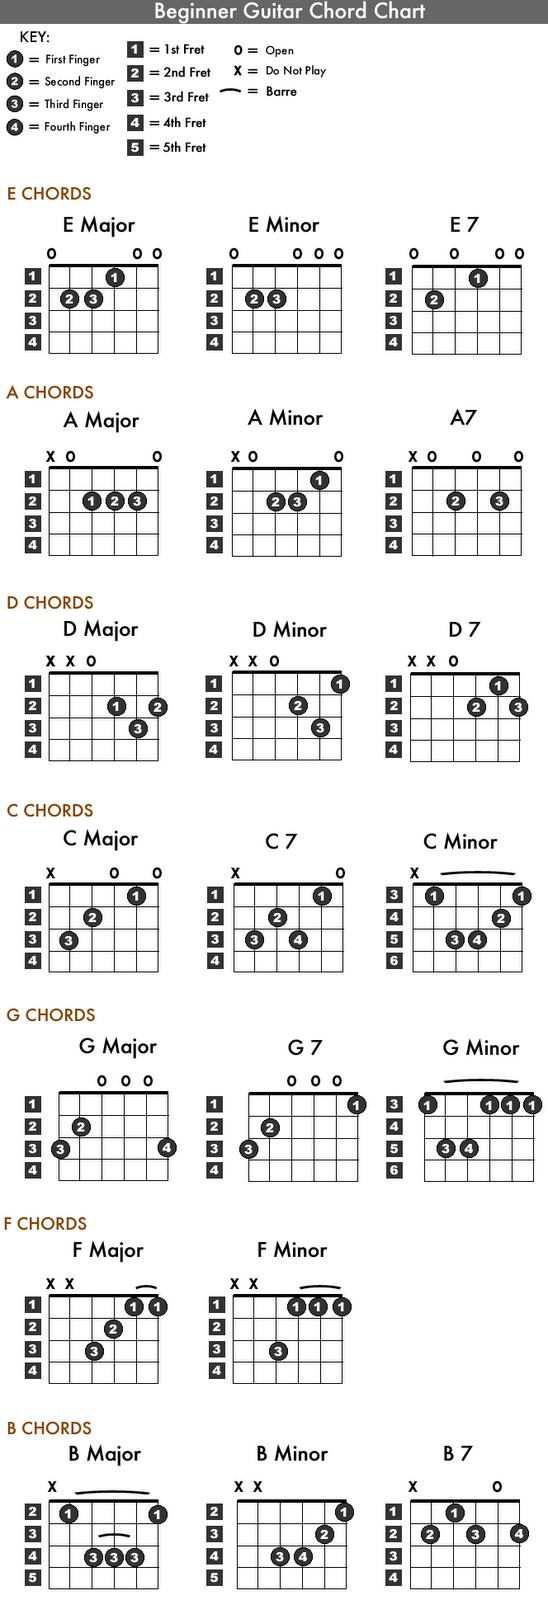 Chord Chartf 5481600 Pixels Electric Guitar Pinterest